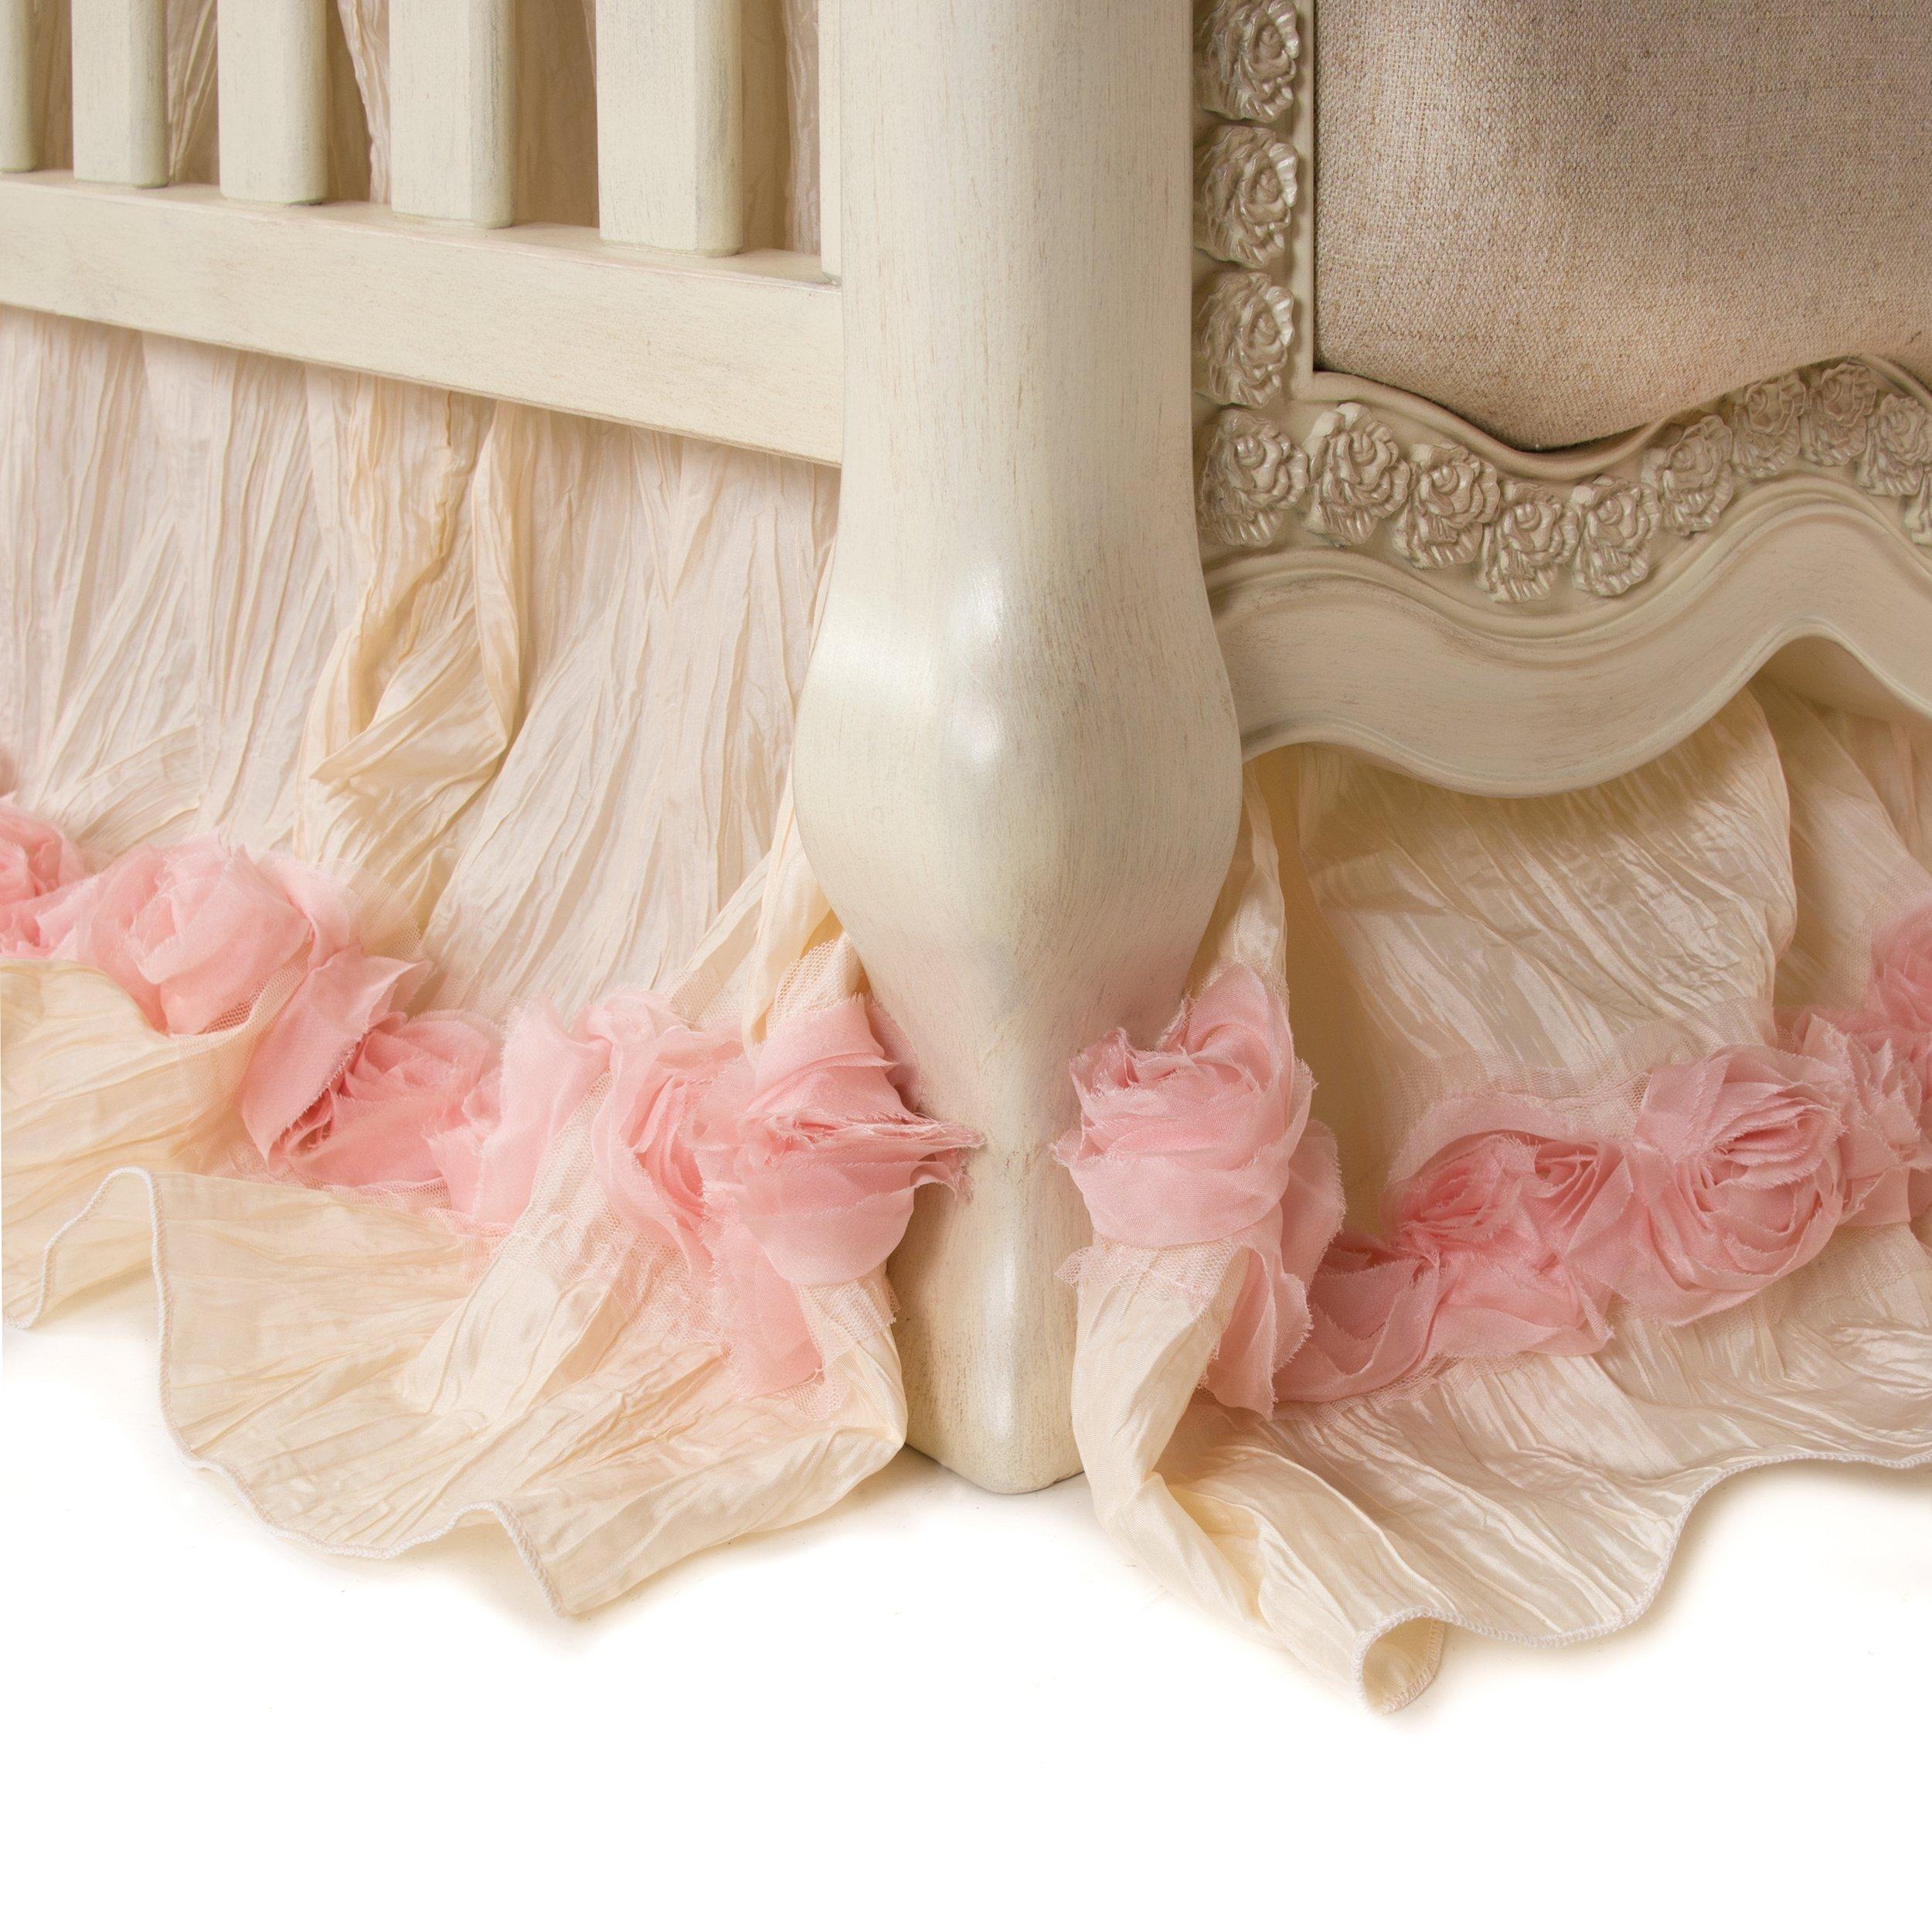 Glenna Jean Crib Skirt Victoria Dust Ruffle for Baby Nursery Crib by Glenna Jean